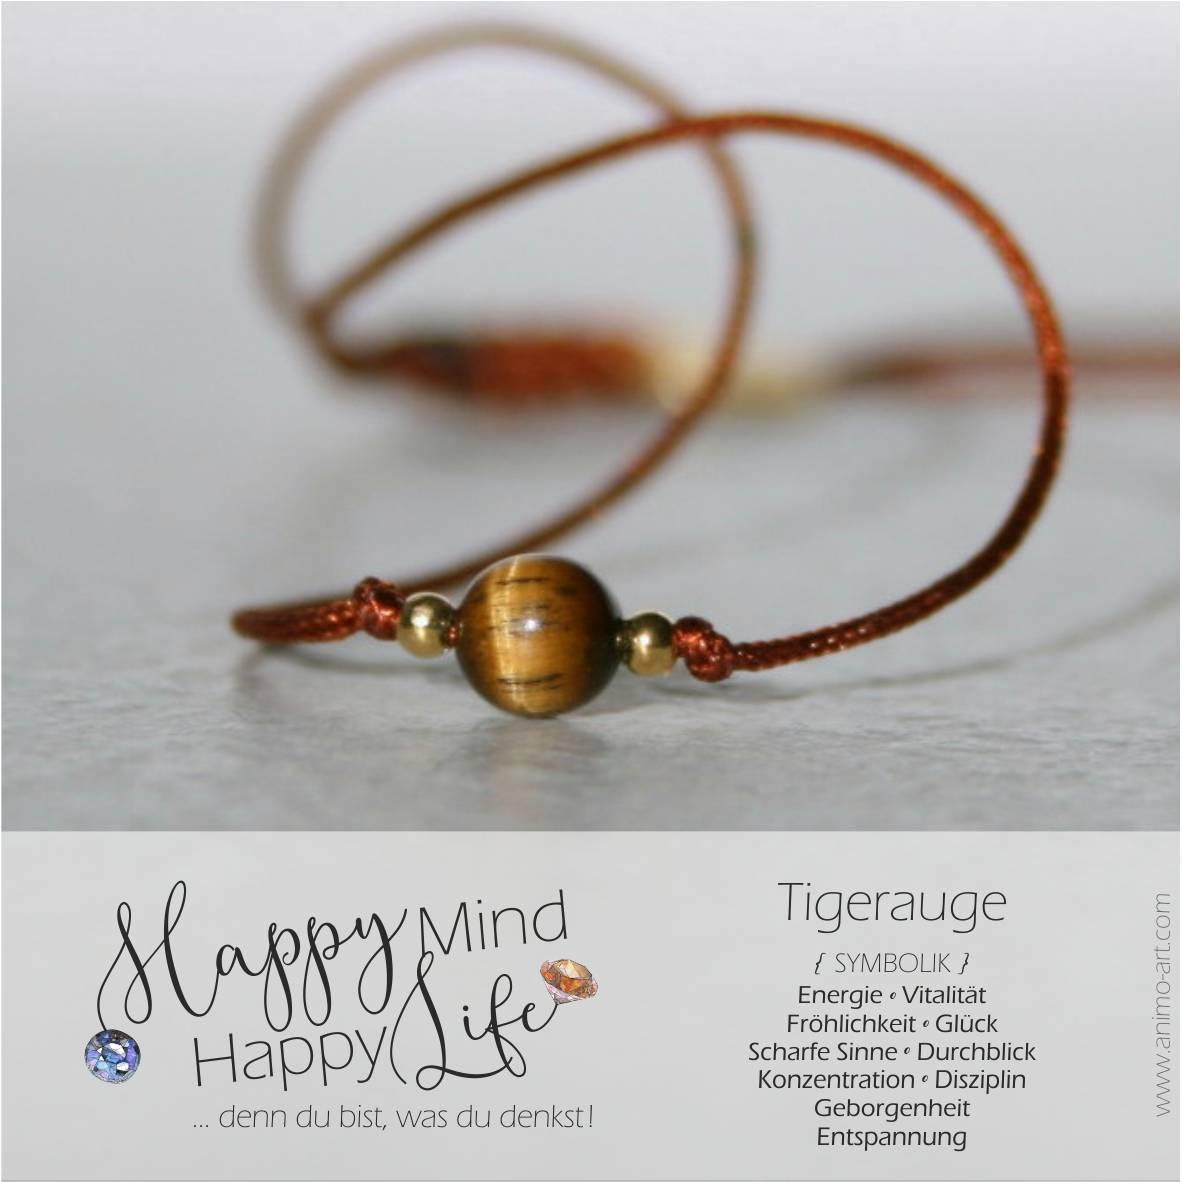 Armband mit Tigerauge-Bedeutung, Perle in braun, Happy Mind Happy Life